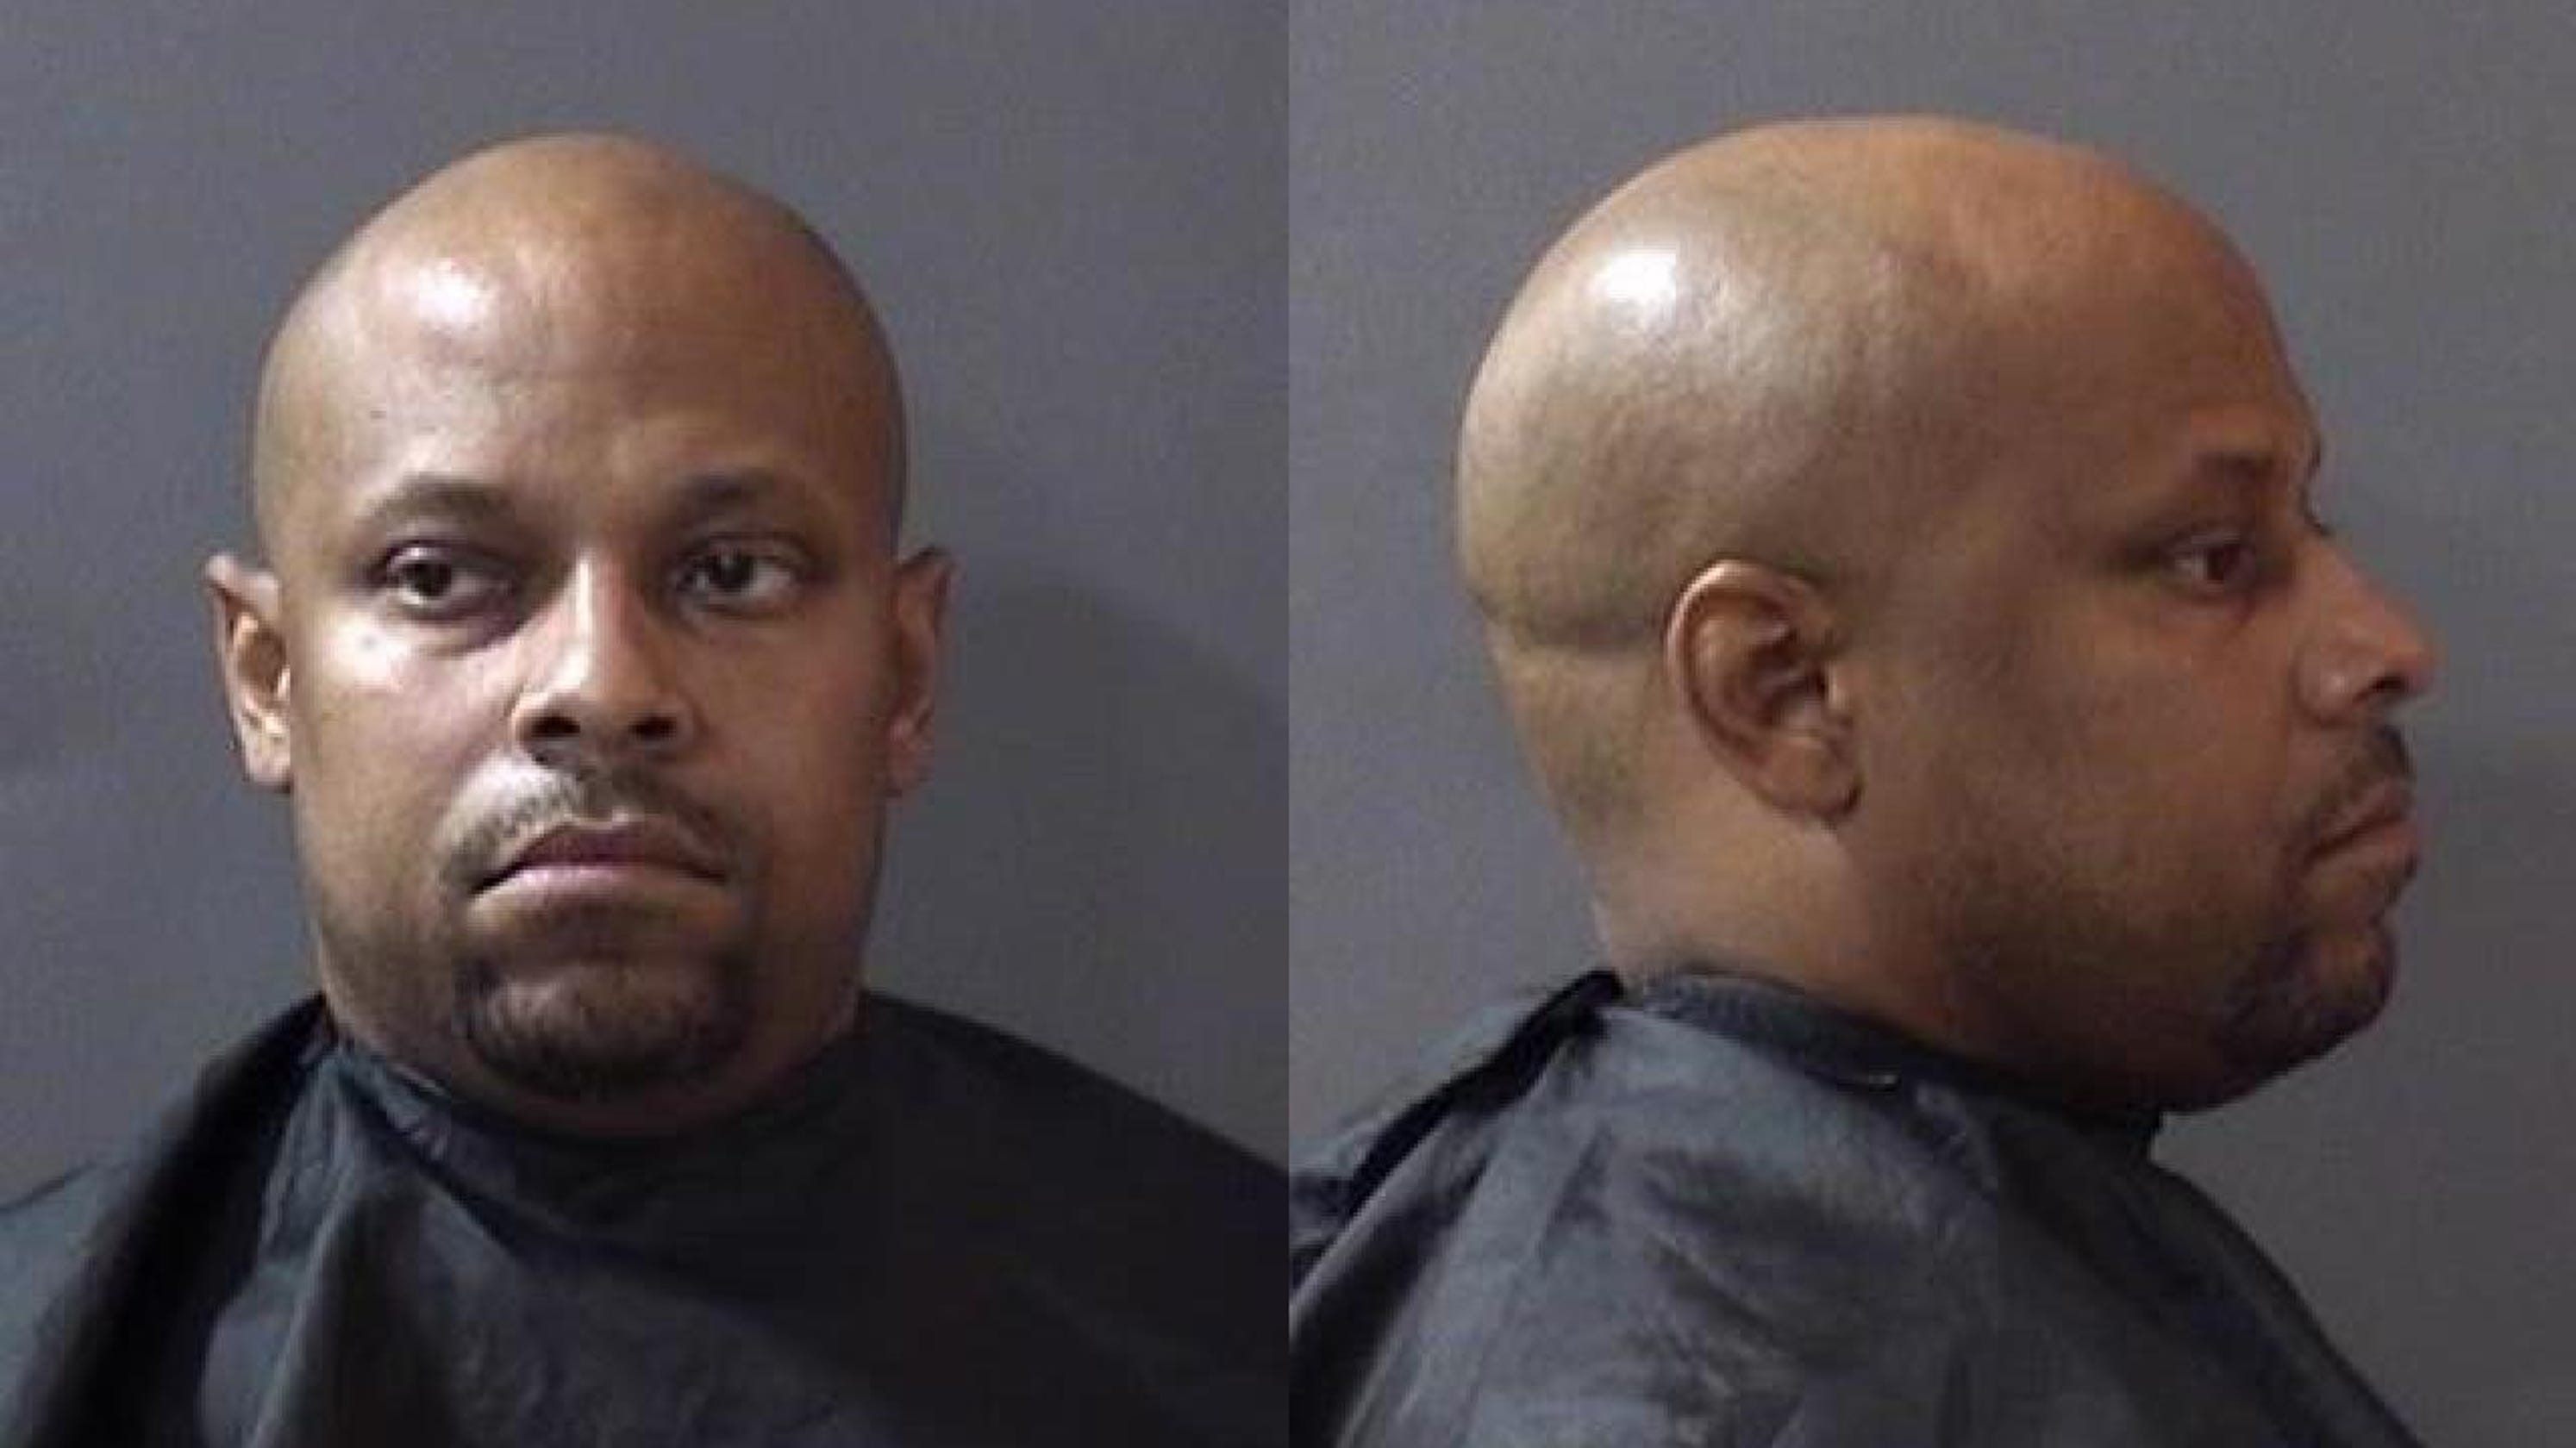 College basketball: Former Arizona star Jason Gardner arrested